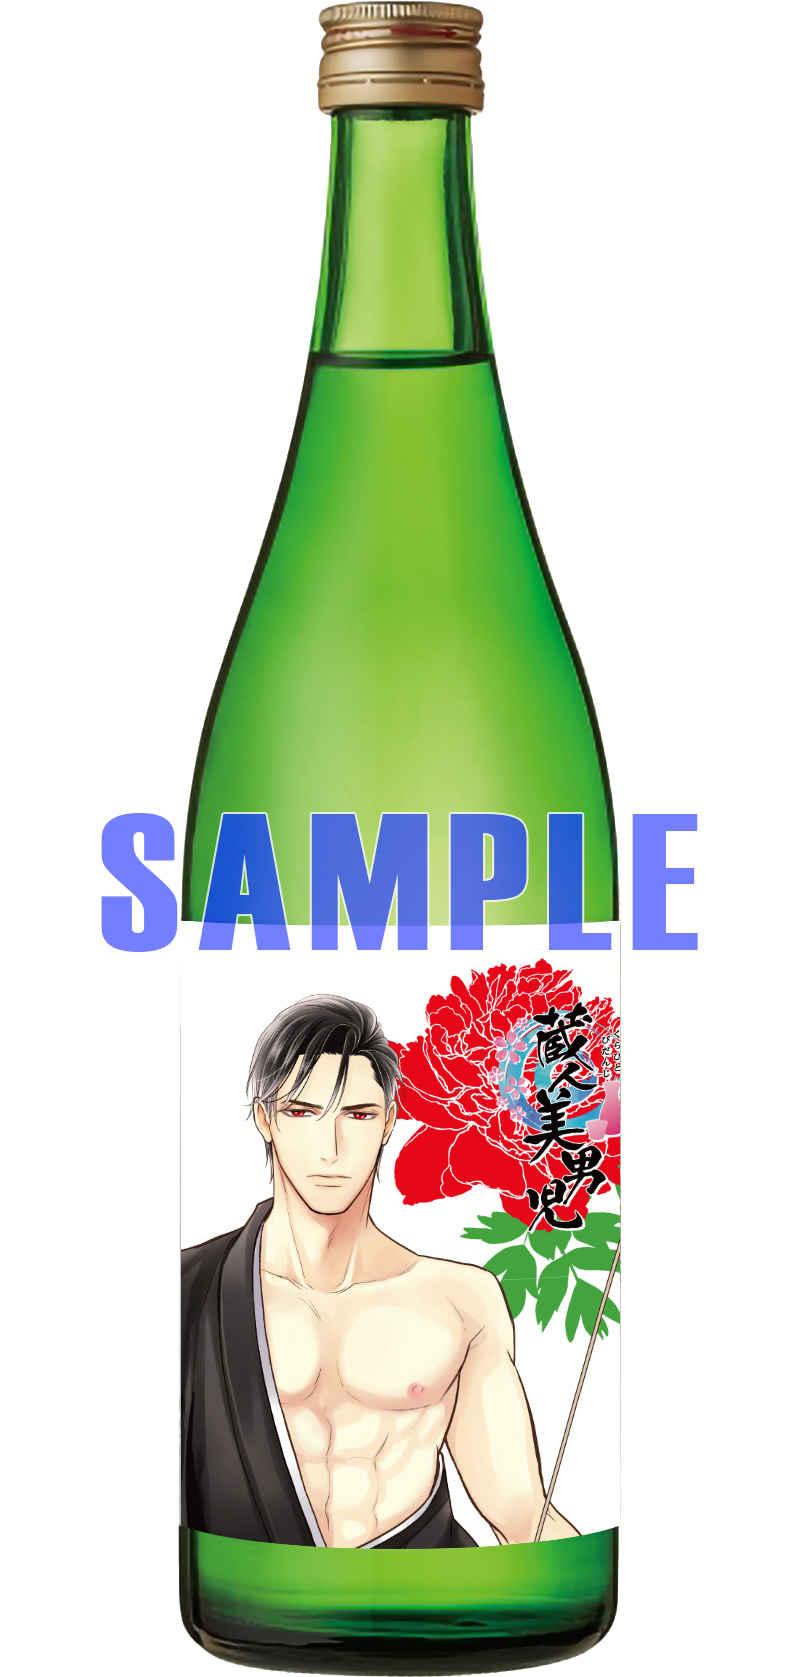 「蔵人美男児」五百蔵吉平(絵 藤河るり)劍門(純米吟醸酒)720ml